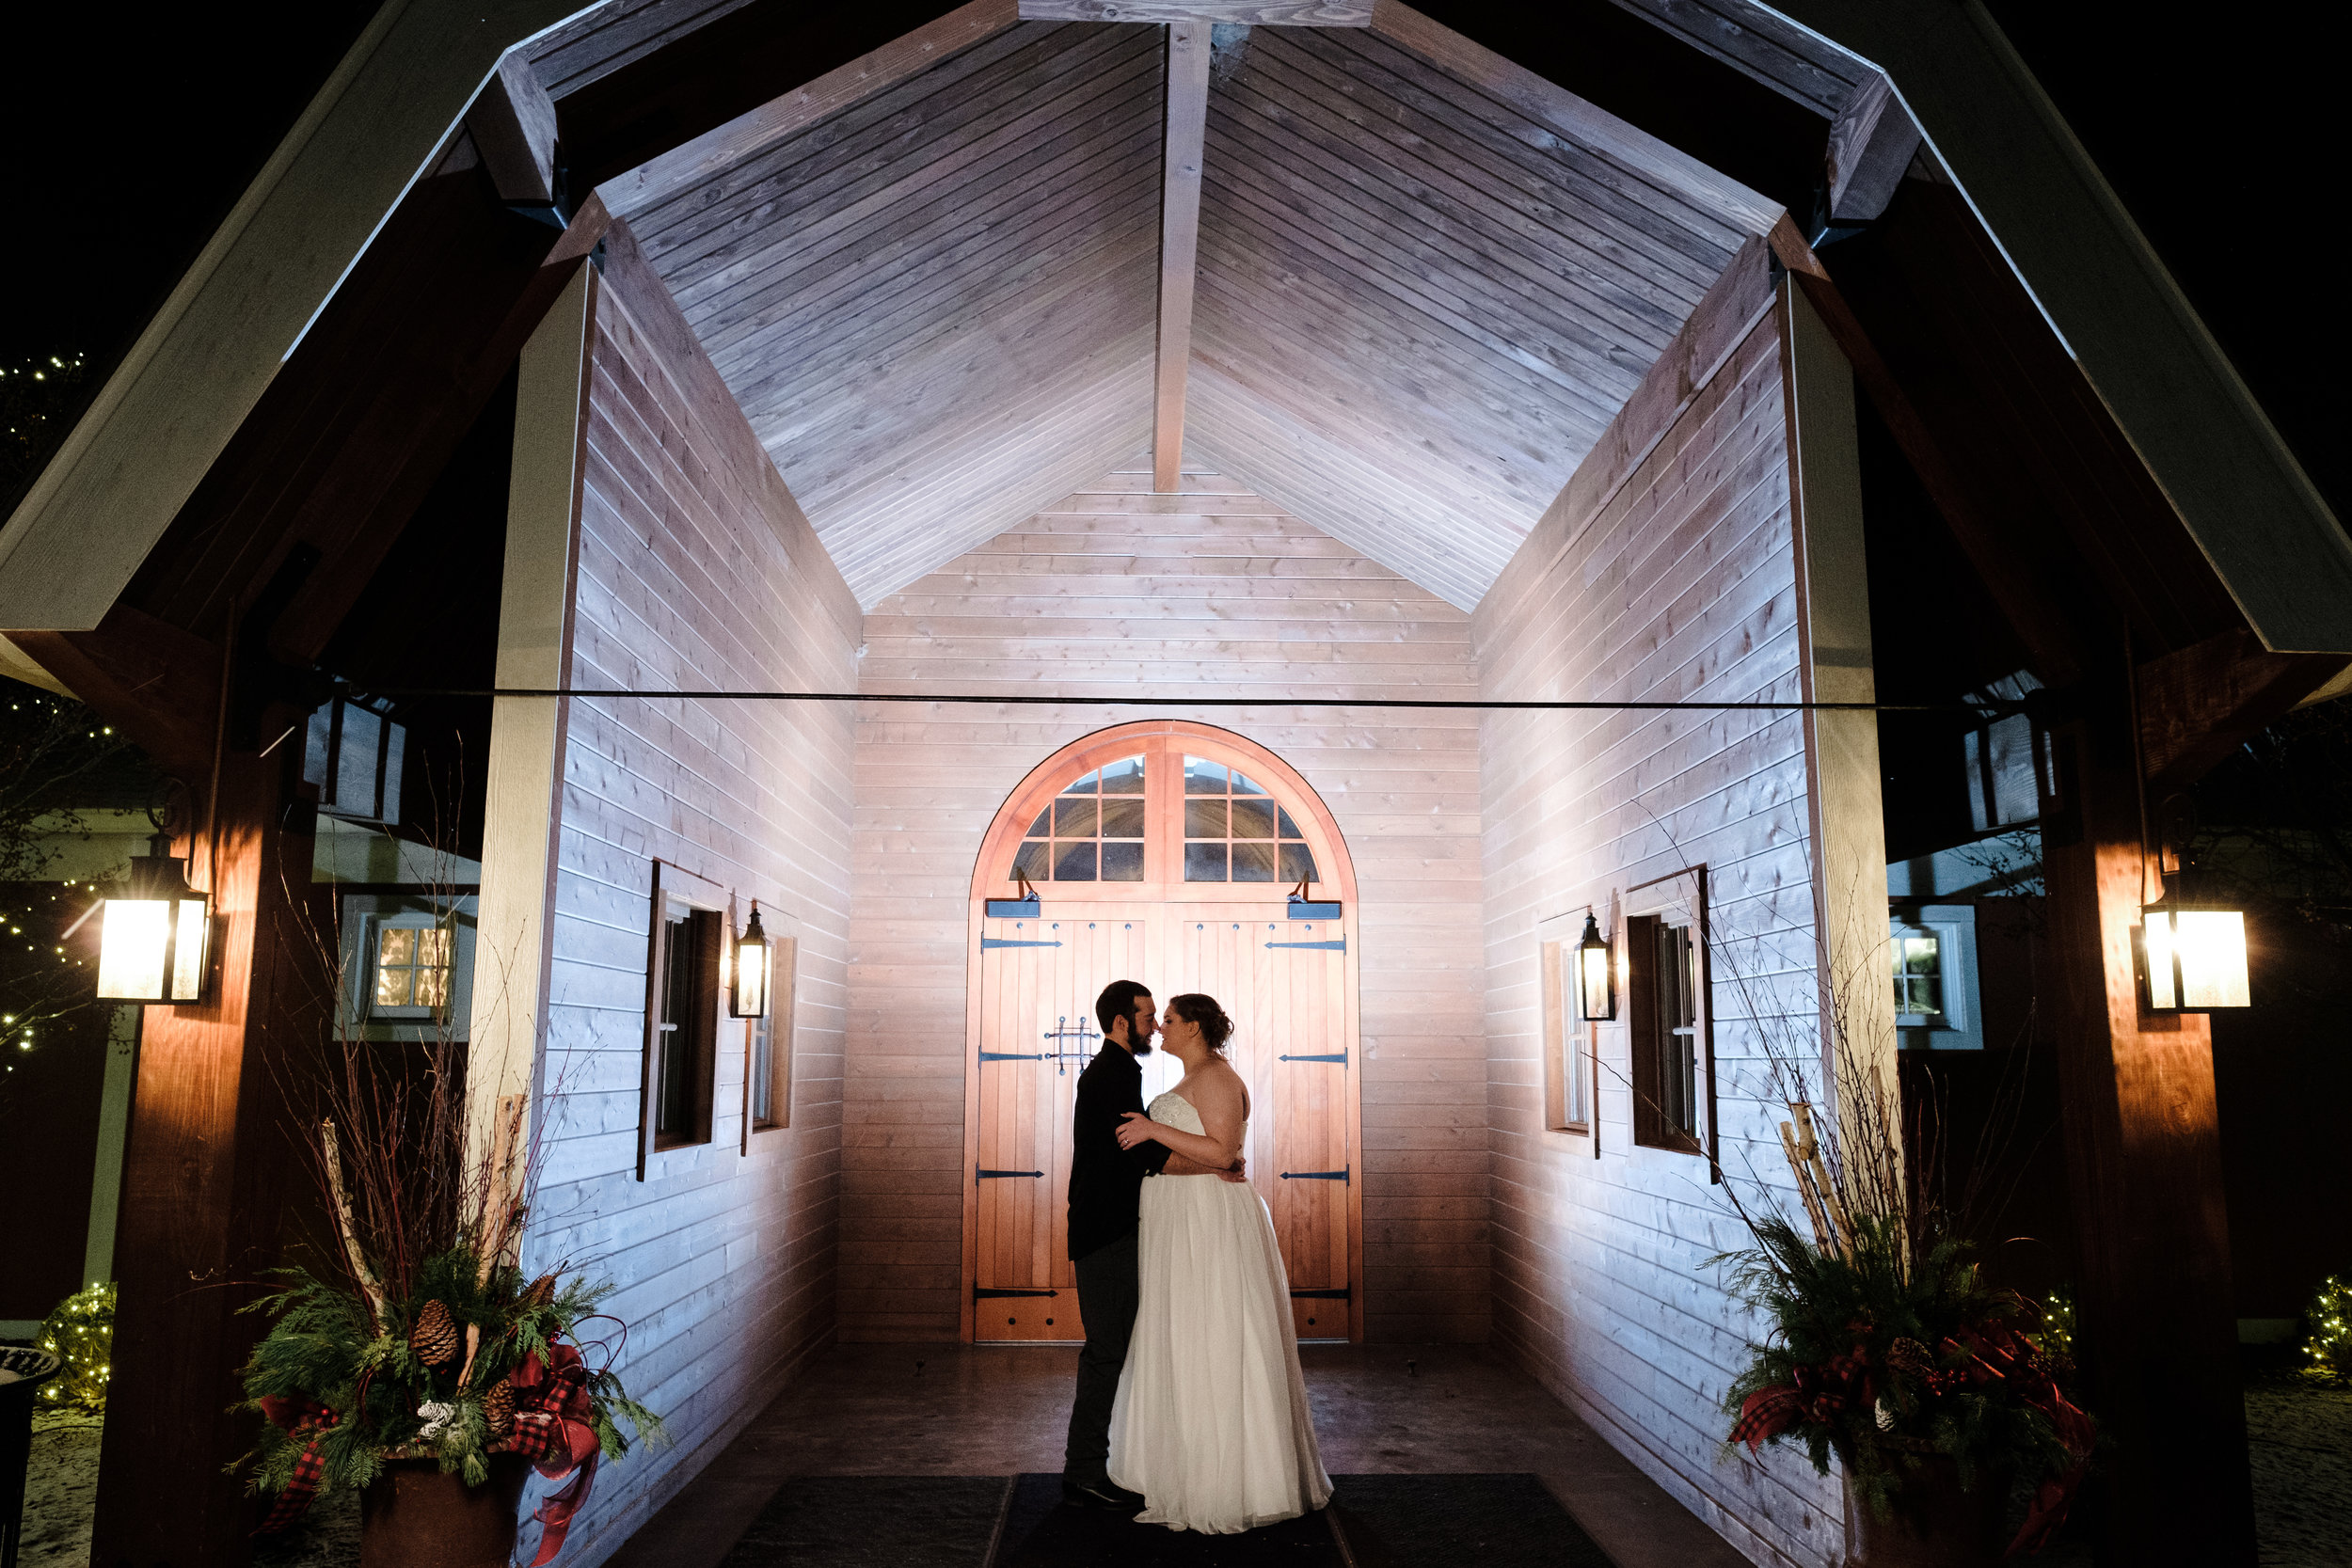 18-12-28 Corinne-Henry-Pavilion-Wedding-637.jpg